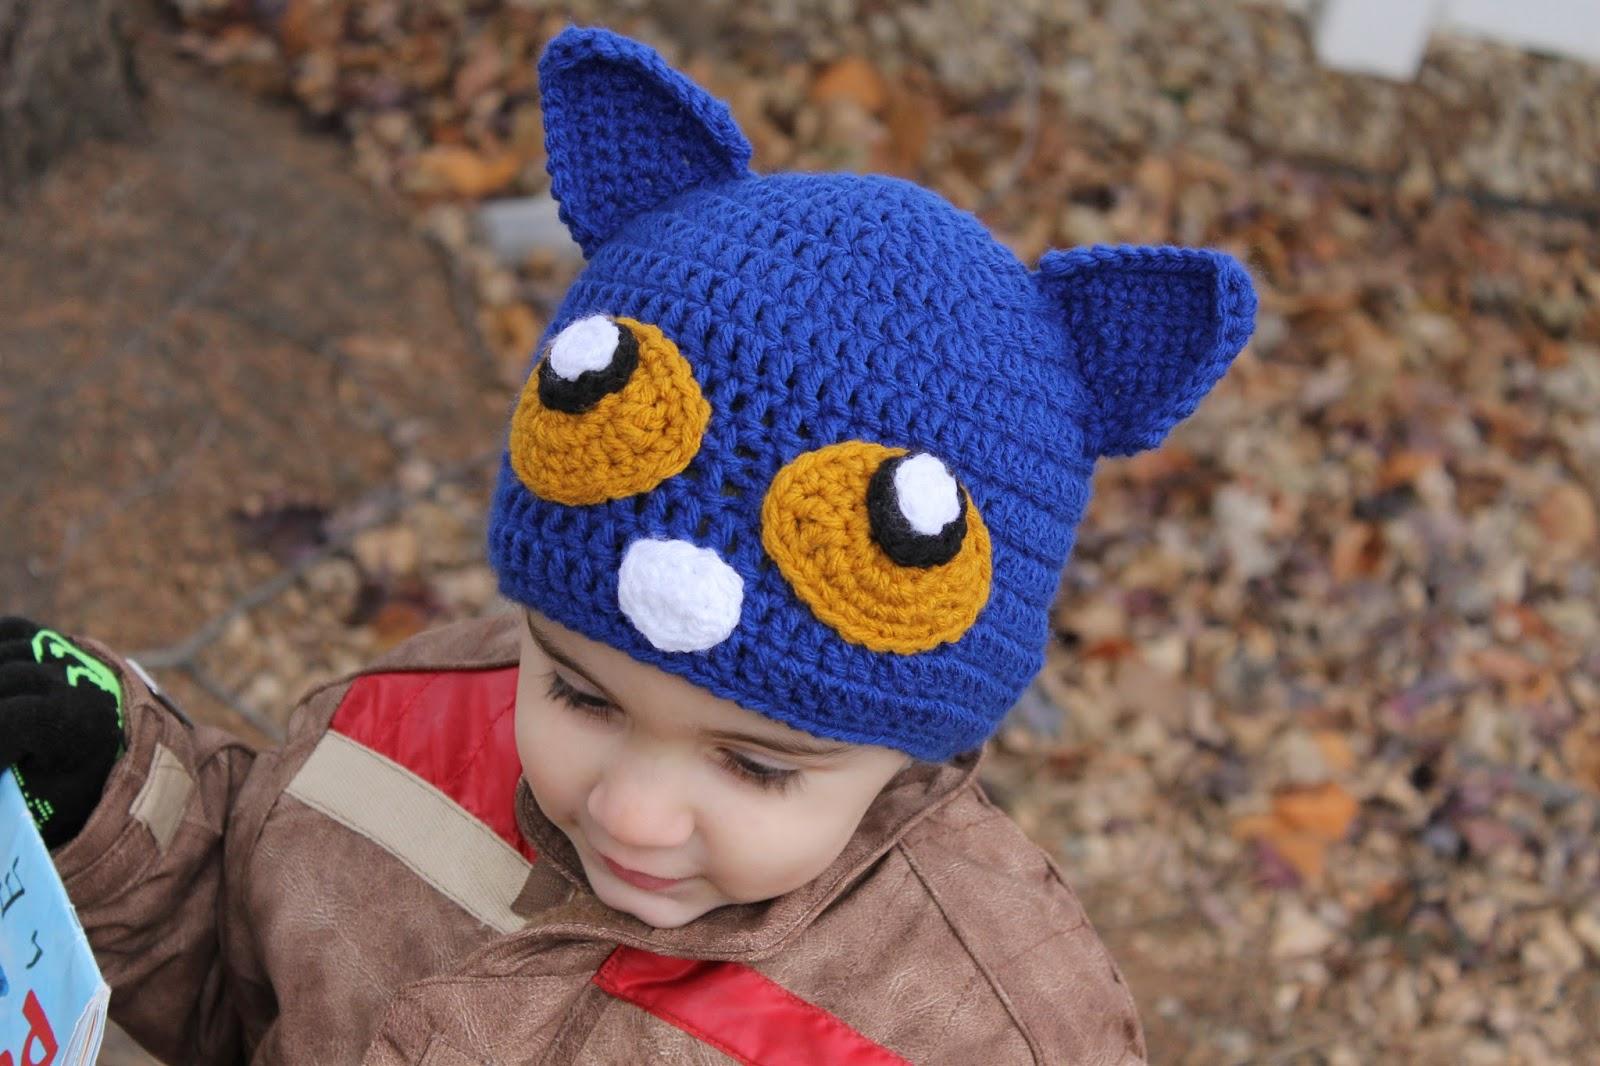 Mnopxs2 The Blog Pete The Cat Crochet Hat Pattern